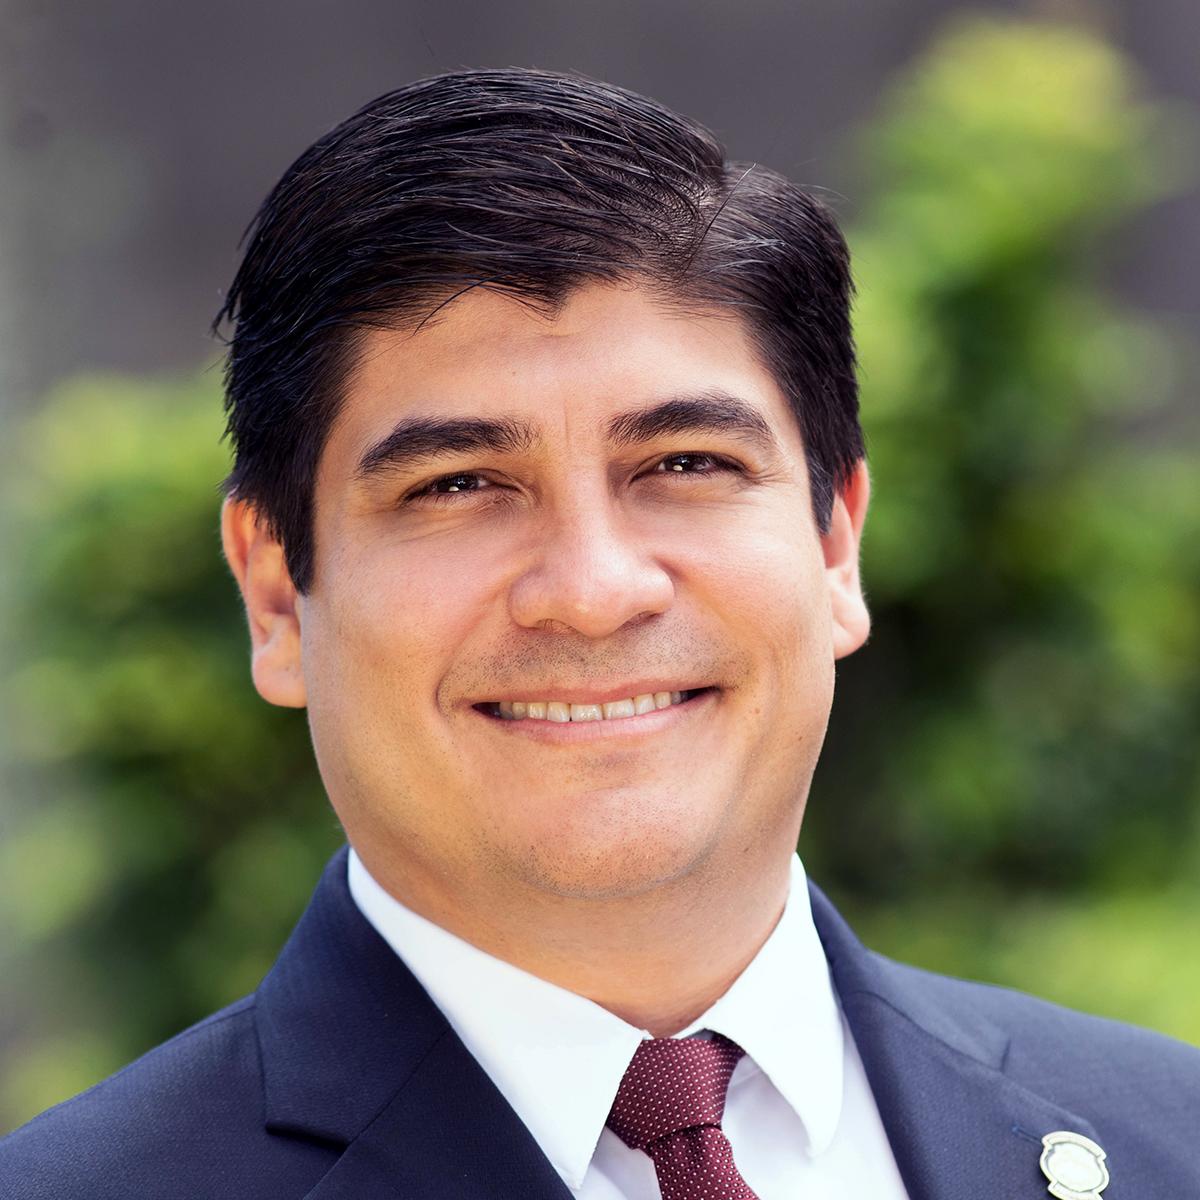 Carlos Andrés Alvarado Quesada